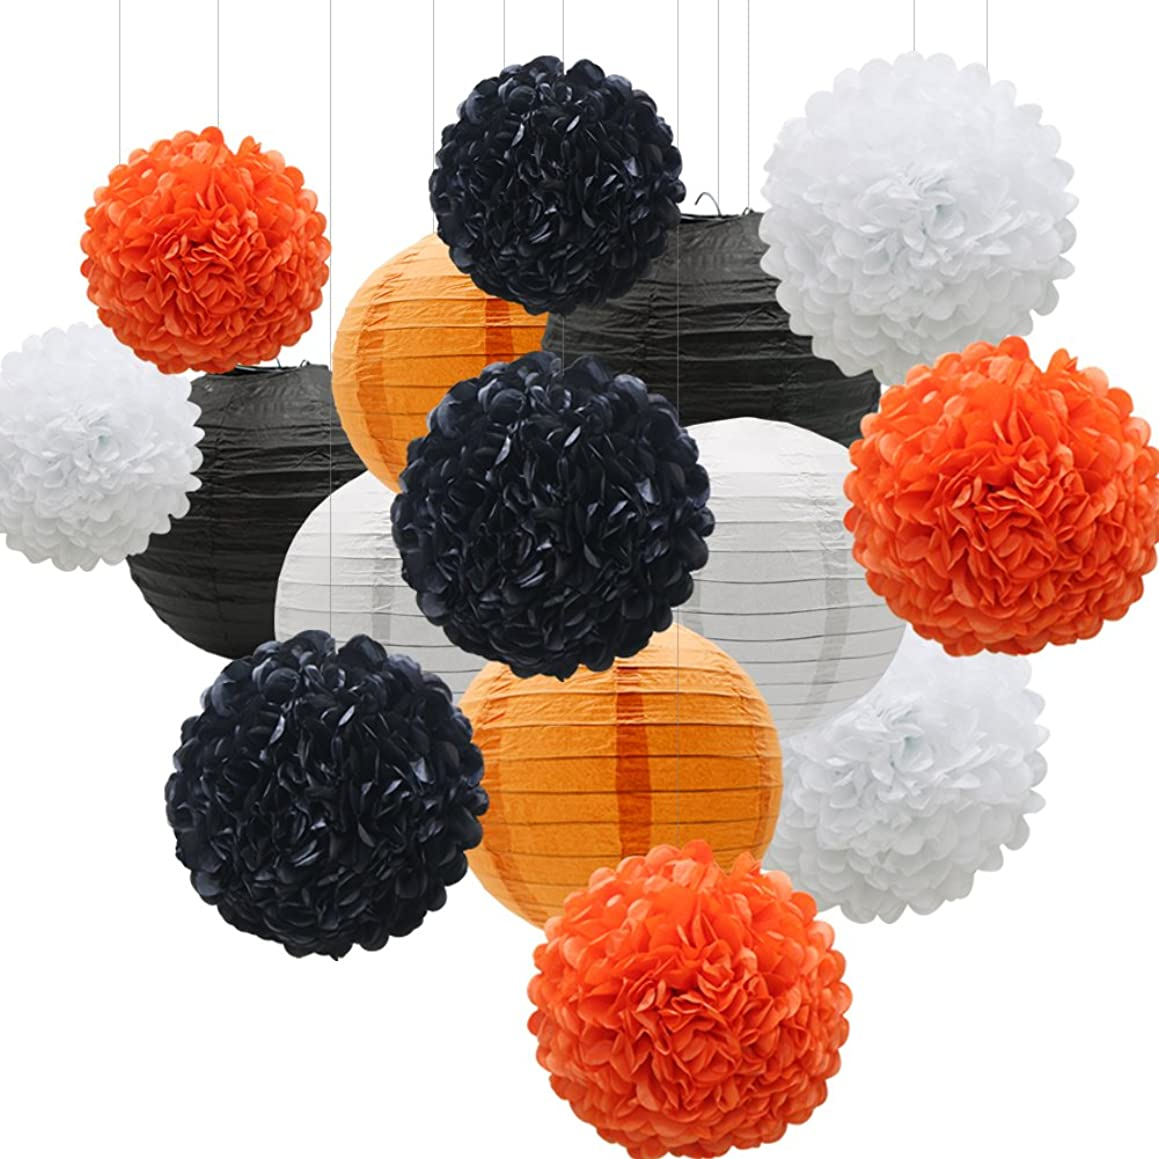 KAXIXI Hanging Party Decorations Set, 15pcs Orange Black White Paper Flowers Pom Poms Balls and Paper Lanterns for Wedding Birthday Bridal Baby Shower Graduation